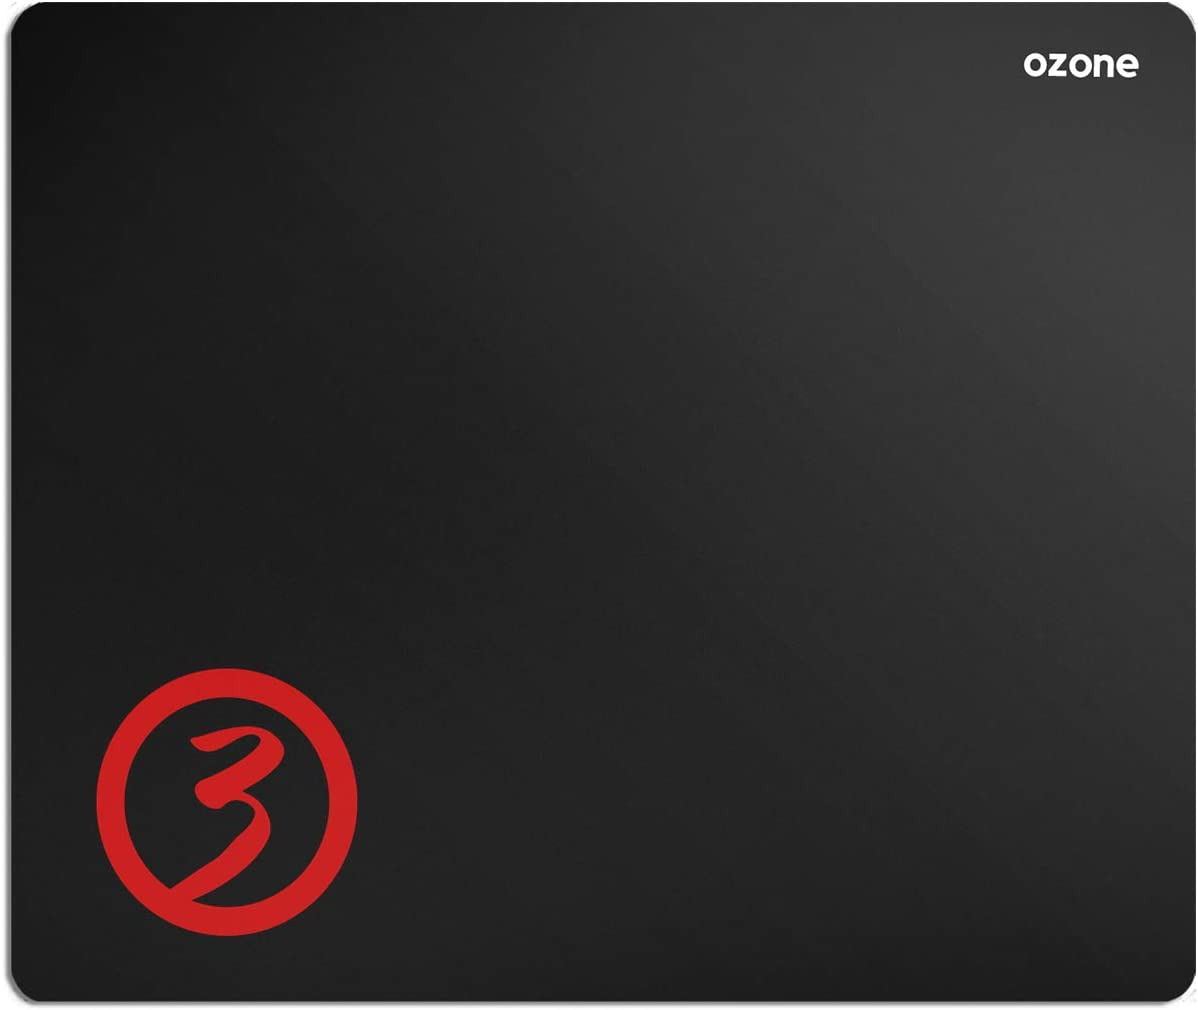 Ozone Gaming Ground Level M - OZGLEVEL - Alfombrilla para Gaming, Monótono